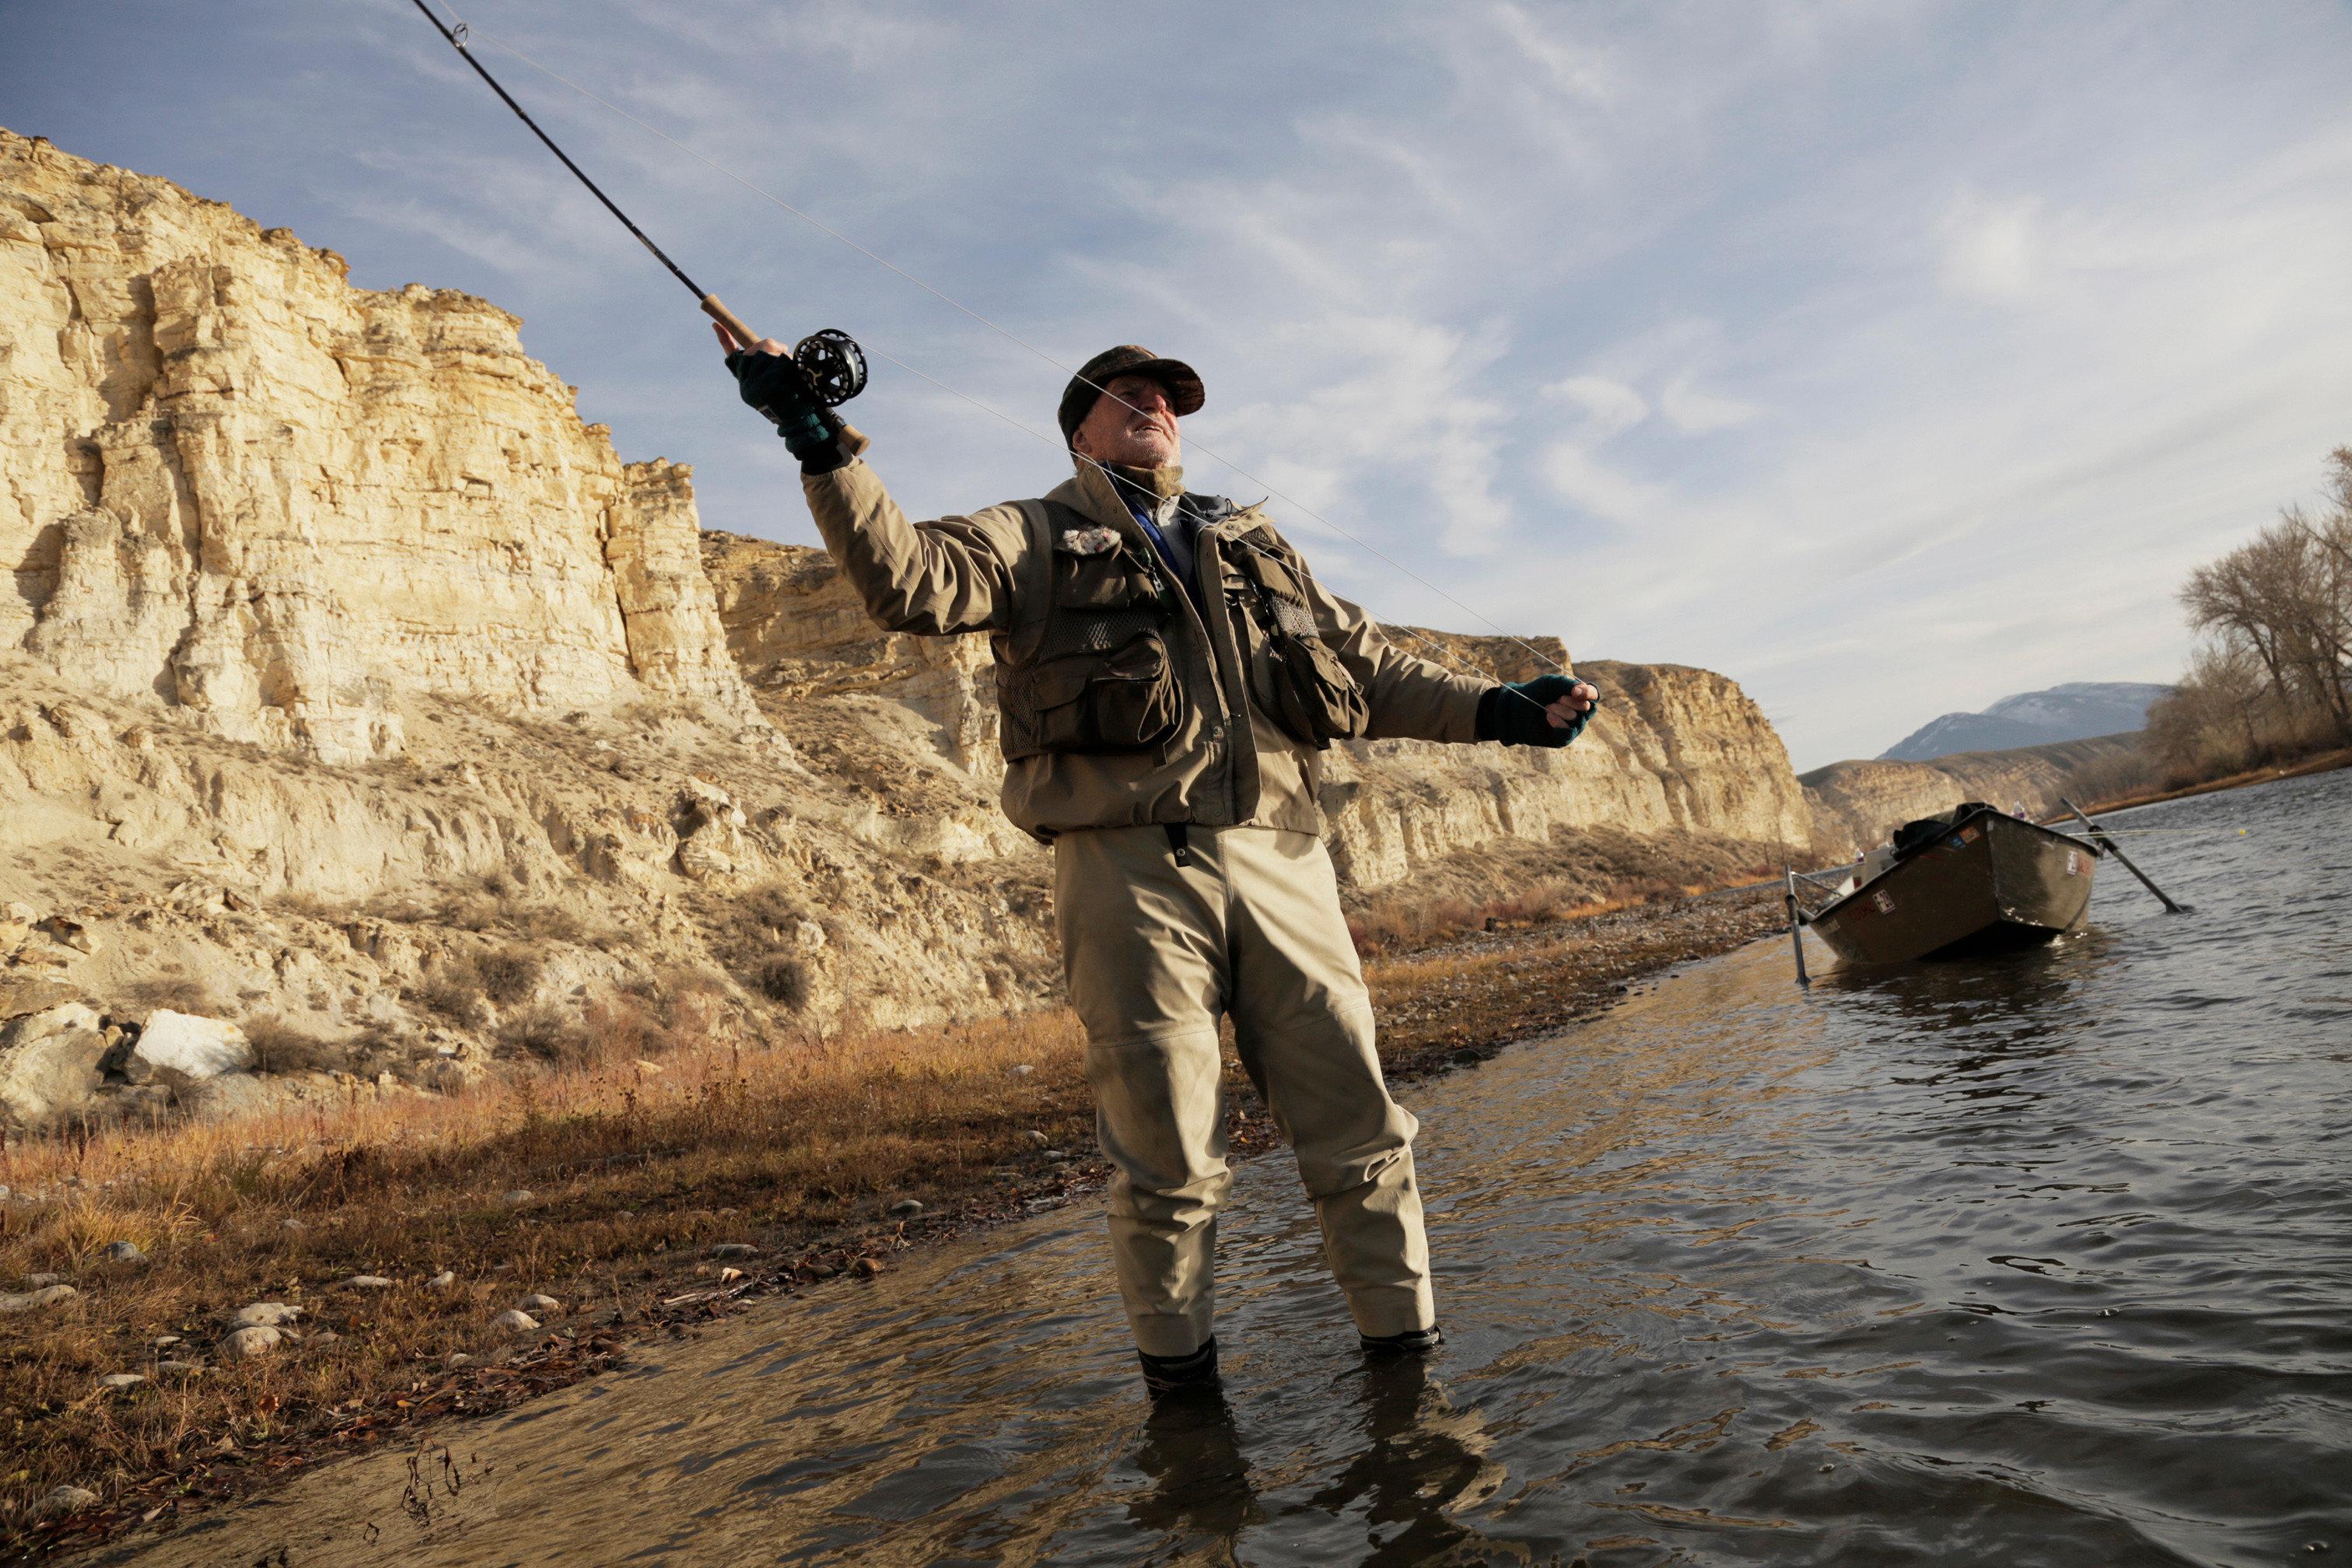 sky man Adventure recreational fishing geology